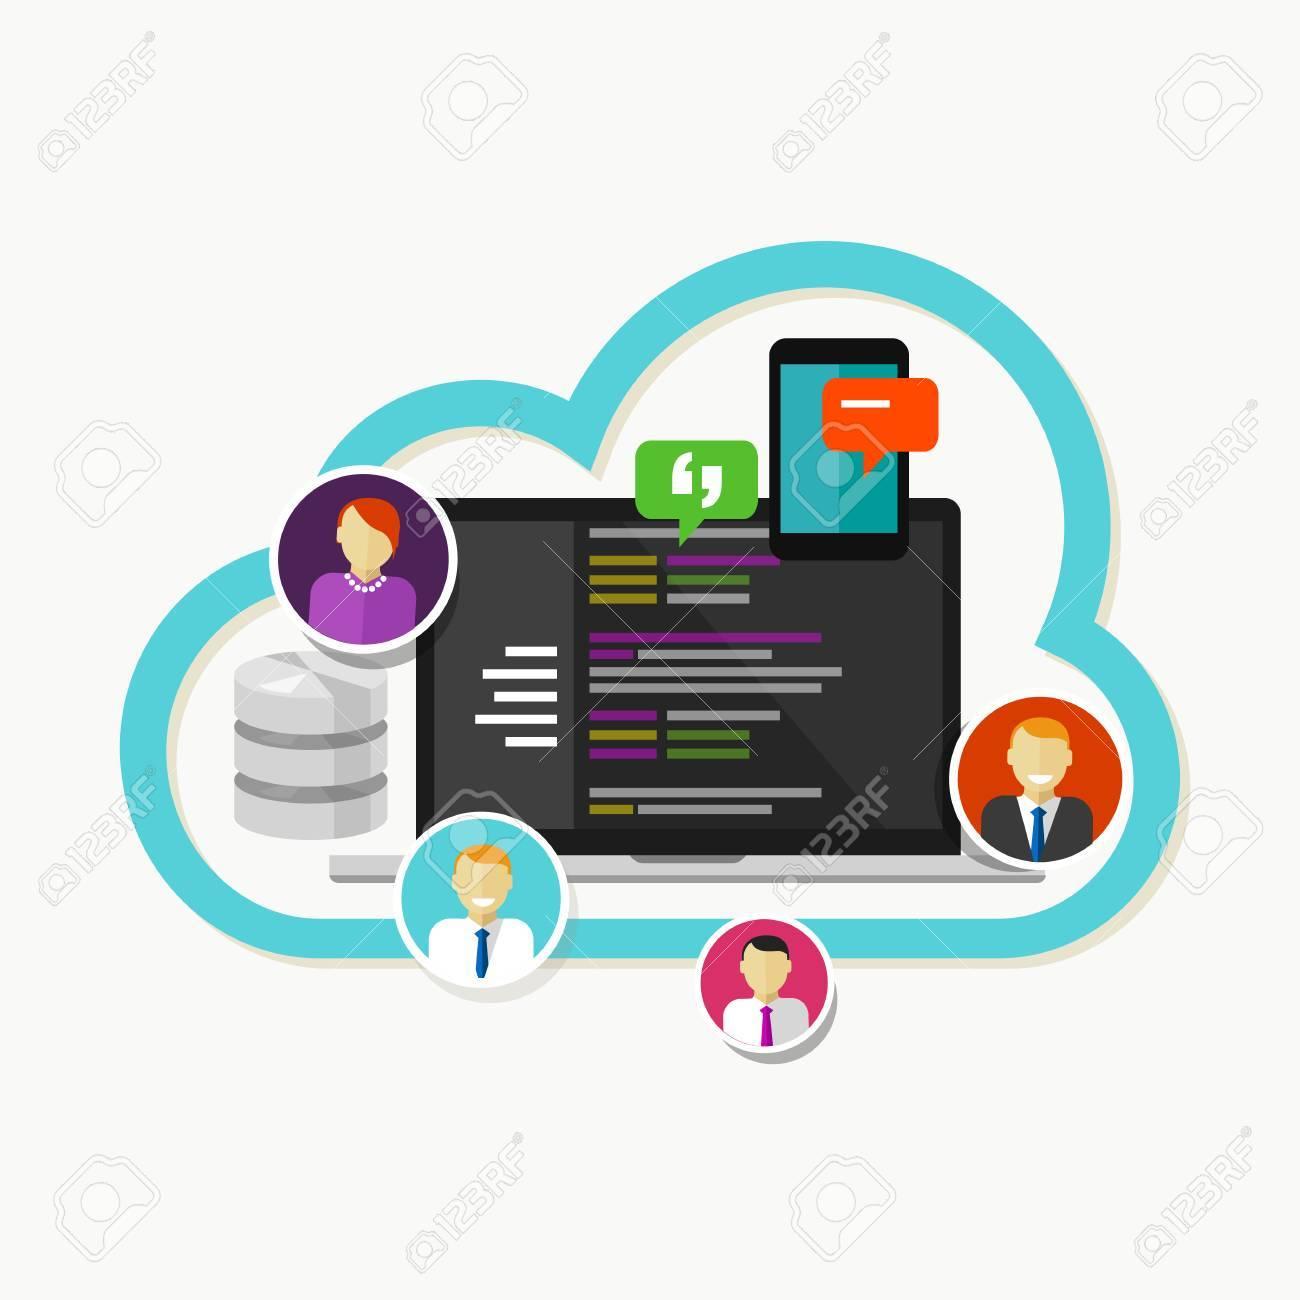 programming web development team collaboration versioning cvs